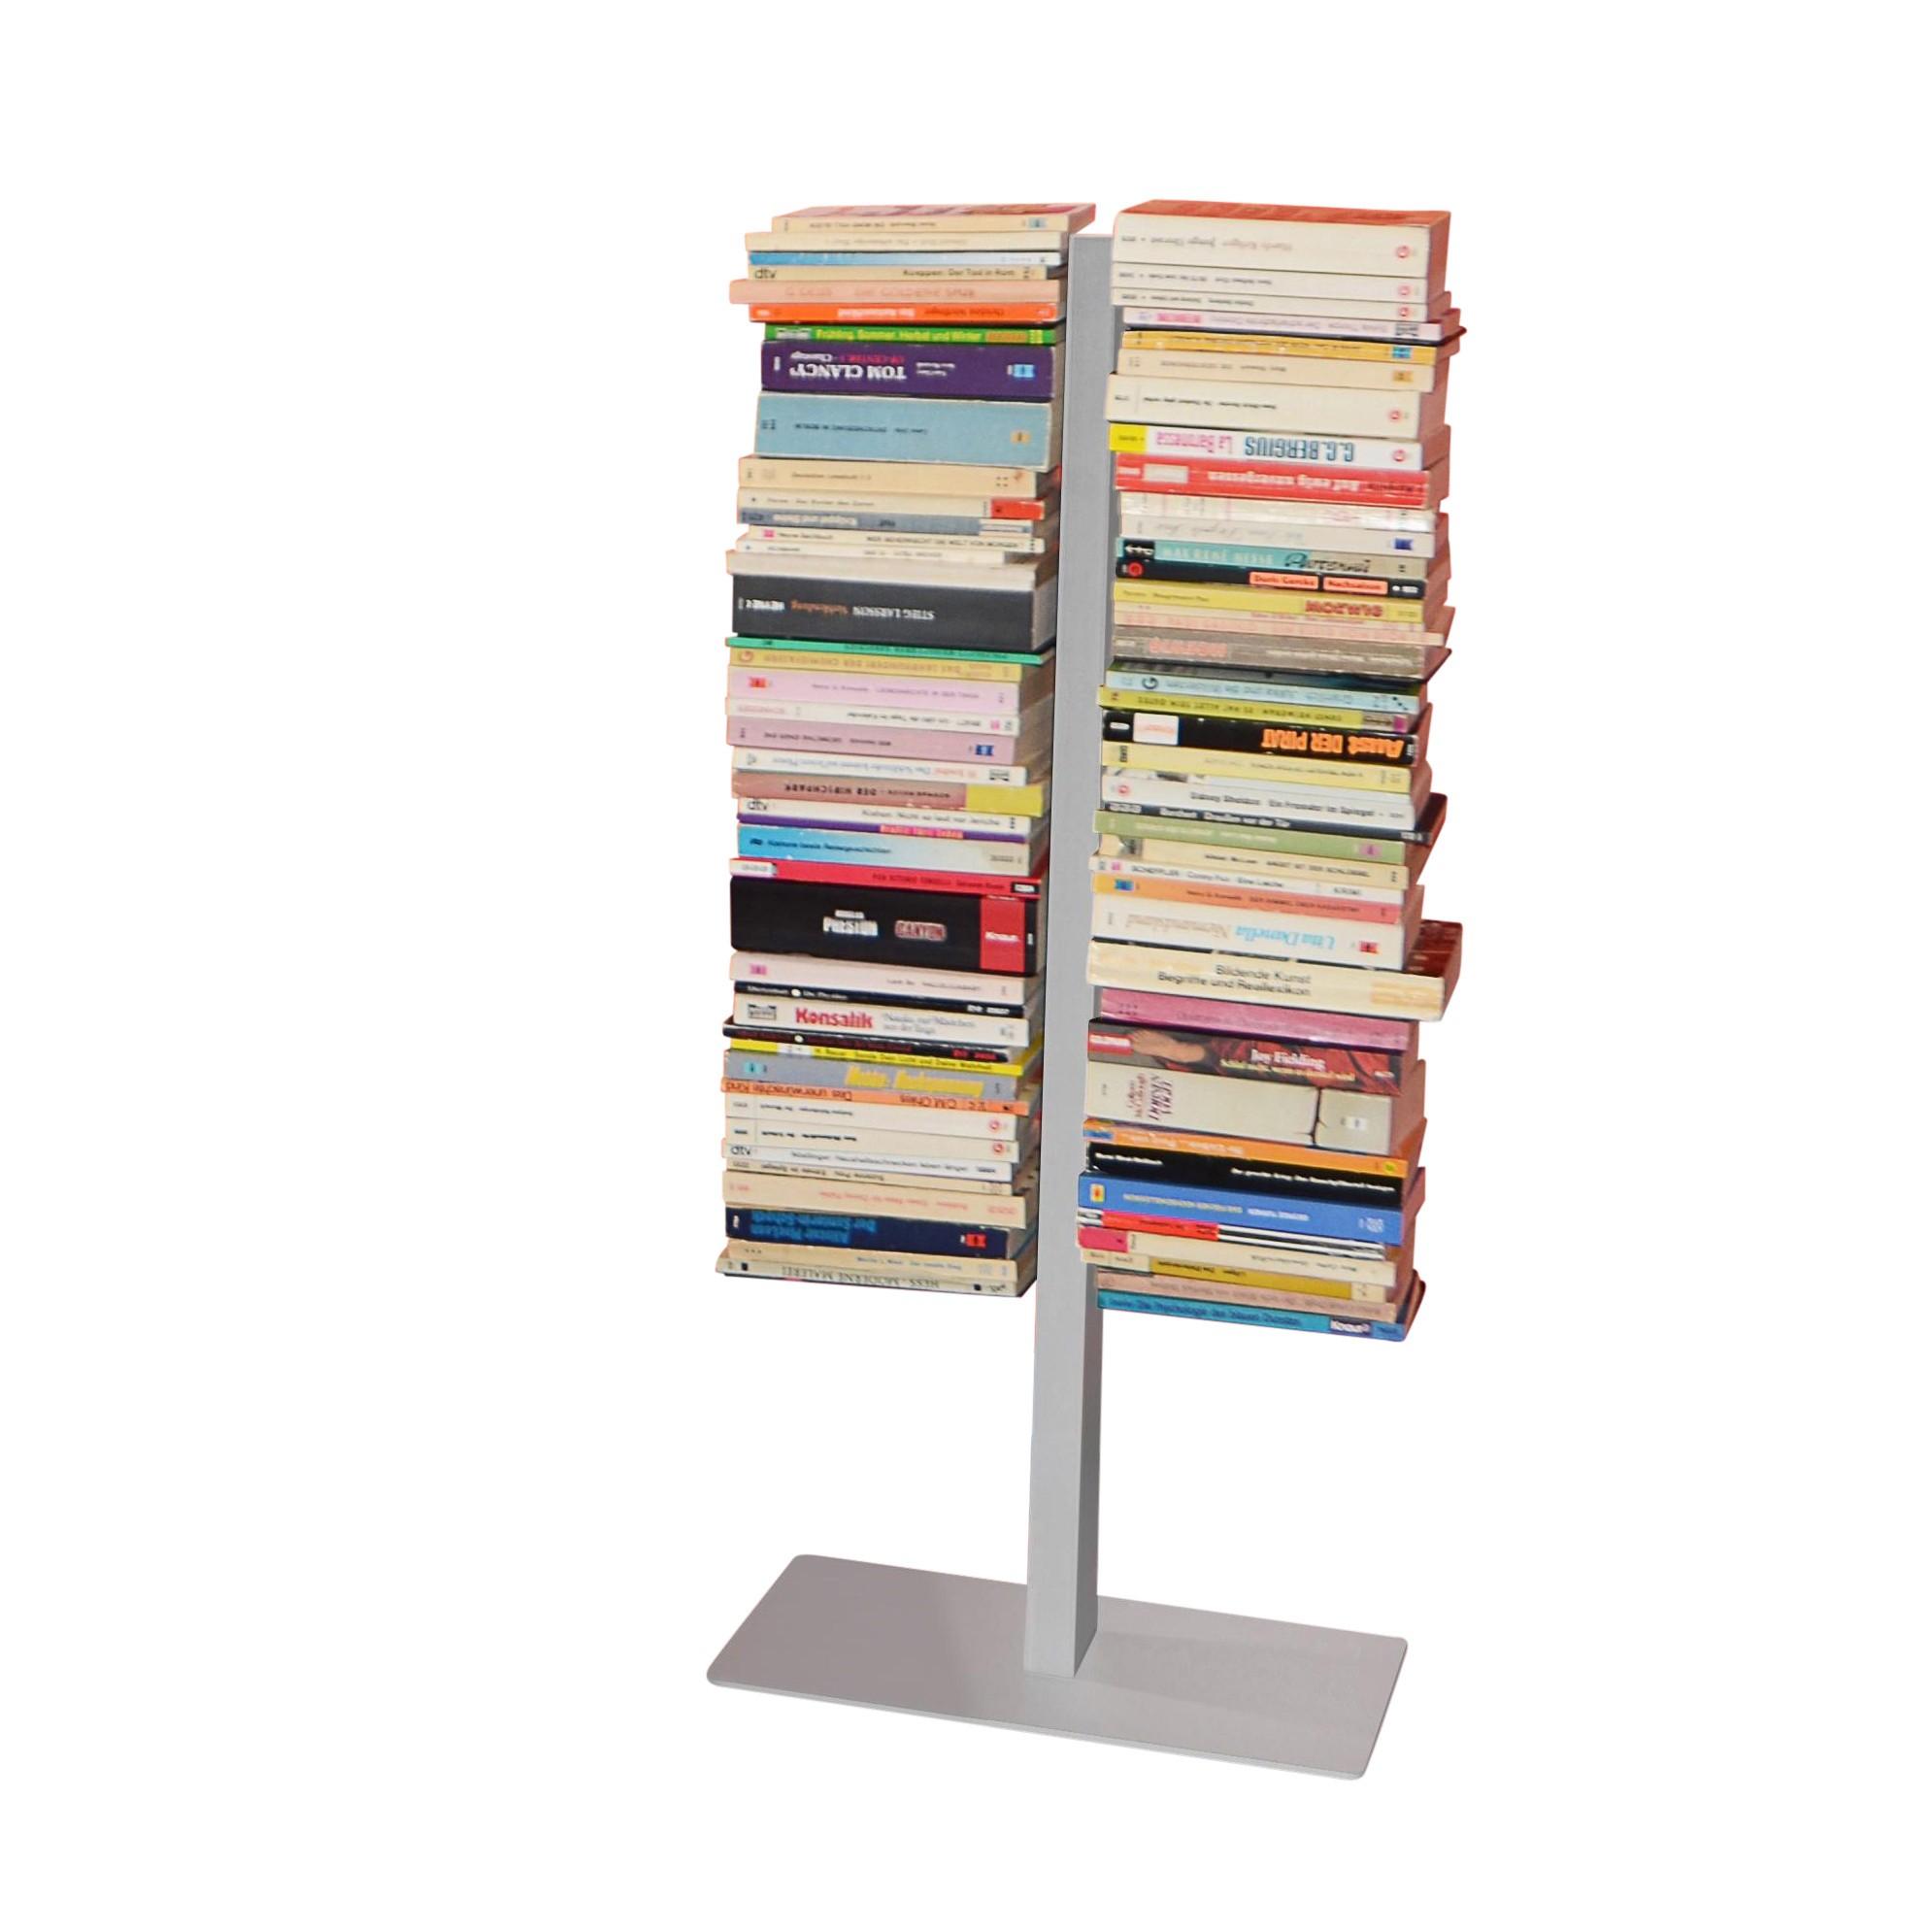 Booksbaum Book Stand Small